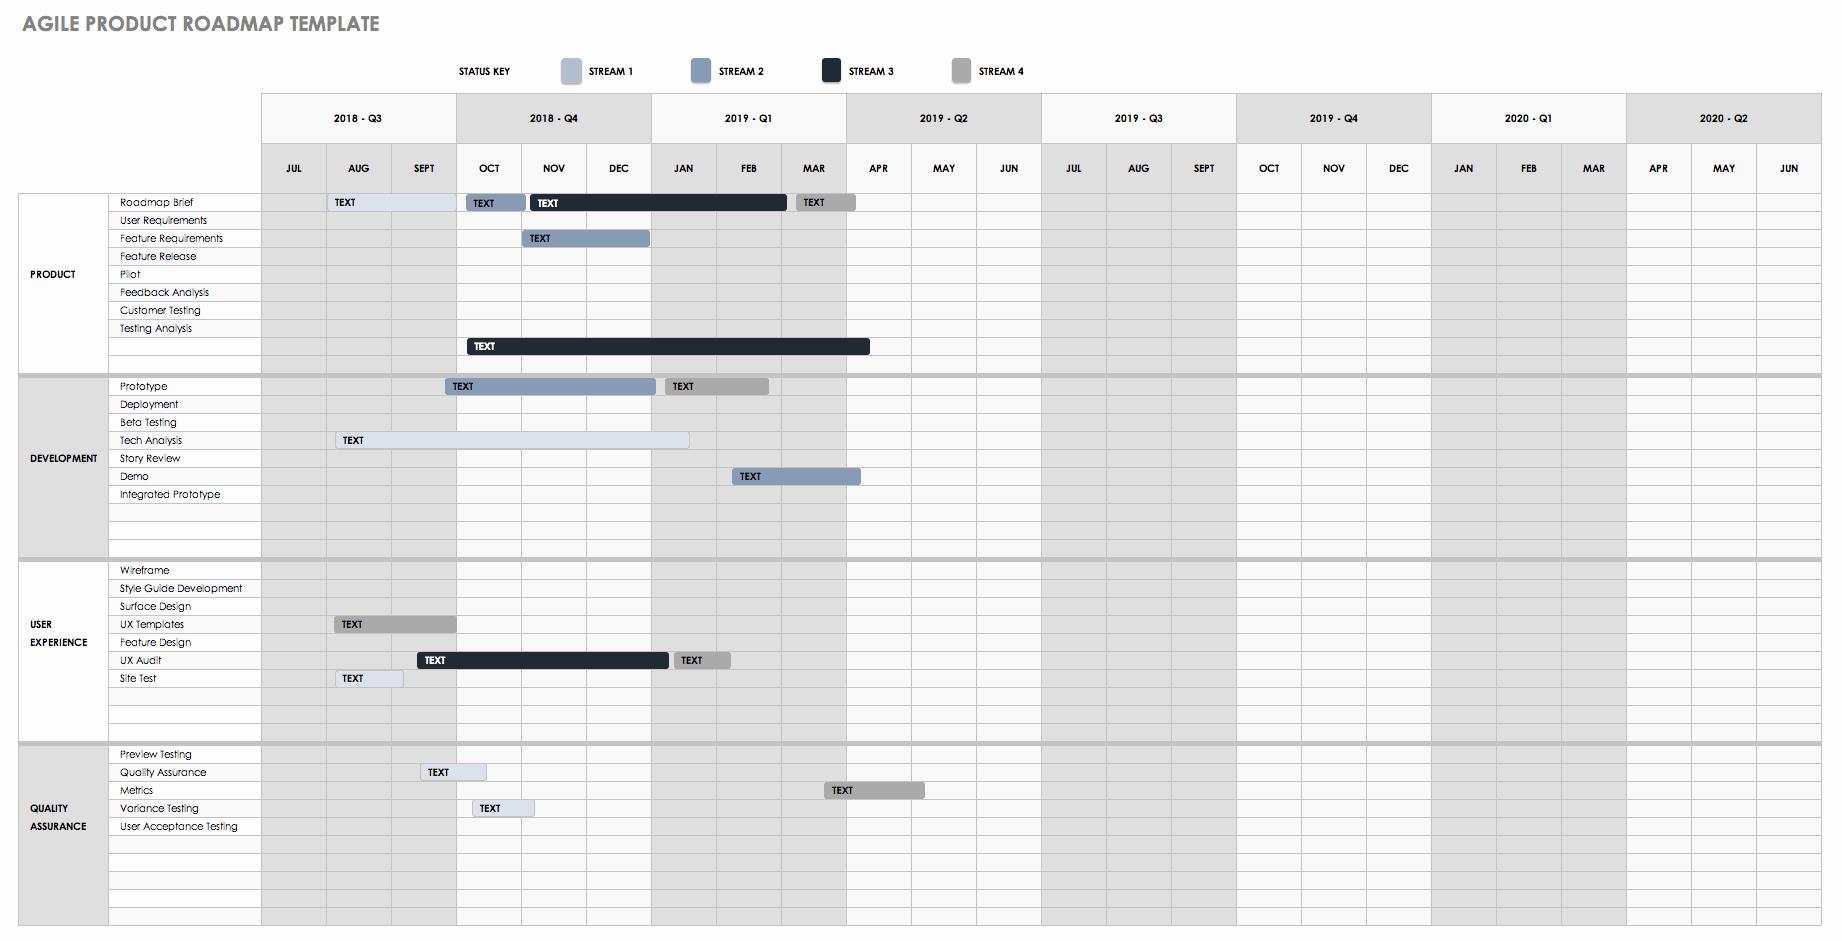 Technology Roadmap Template Excel Unique Free Product Roadmap Templates Smartsheet